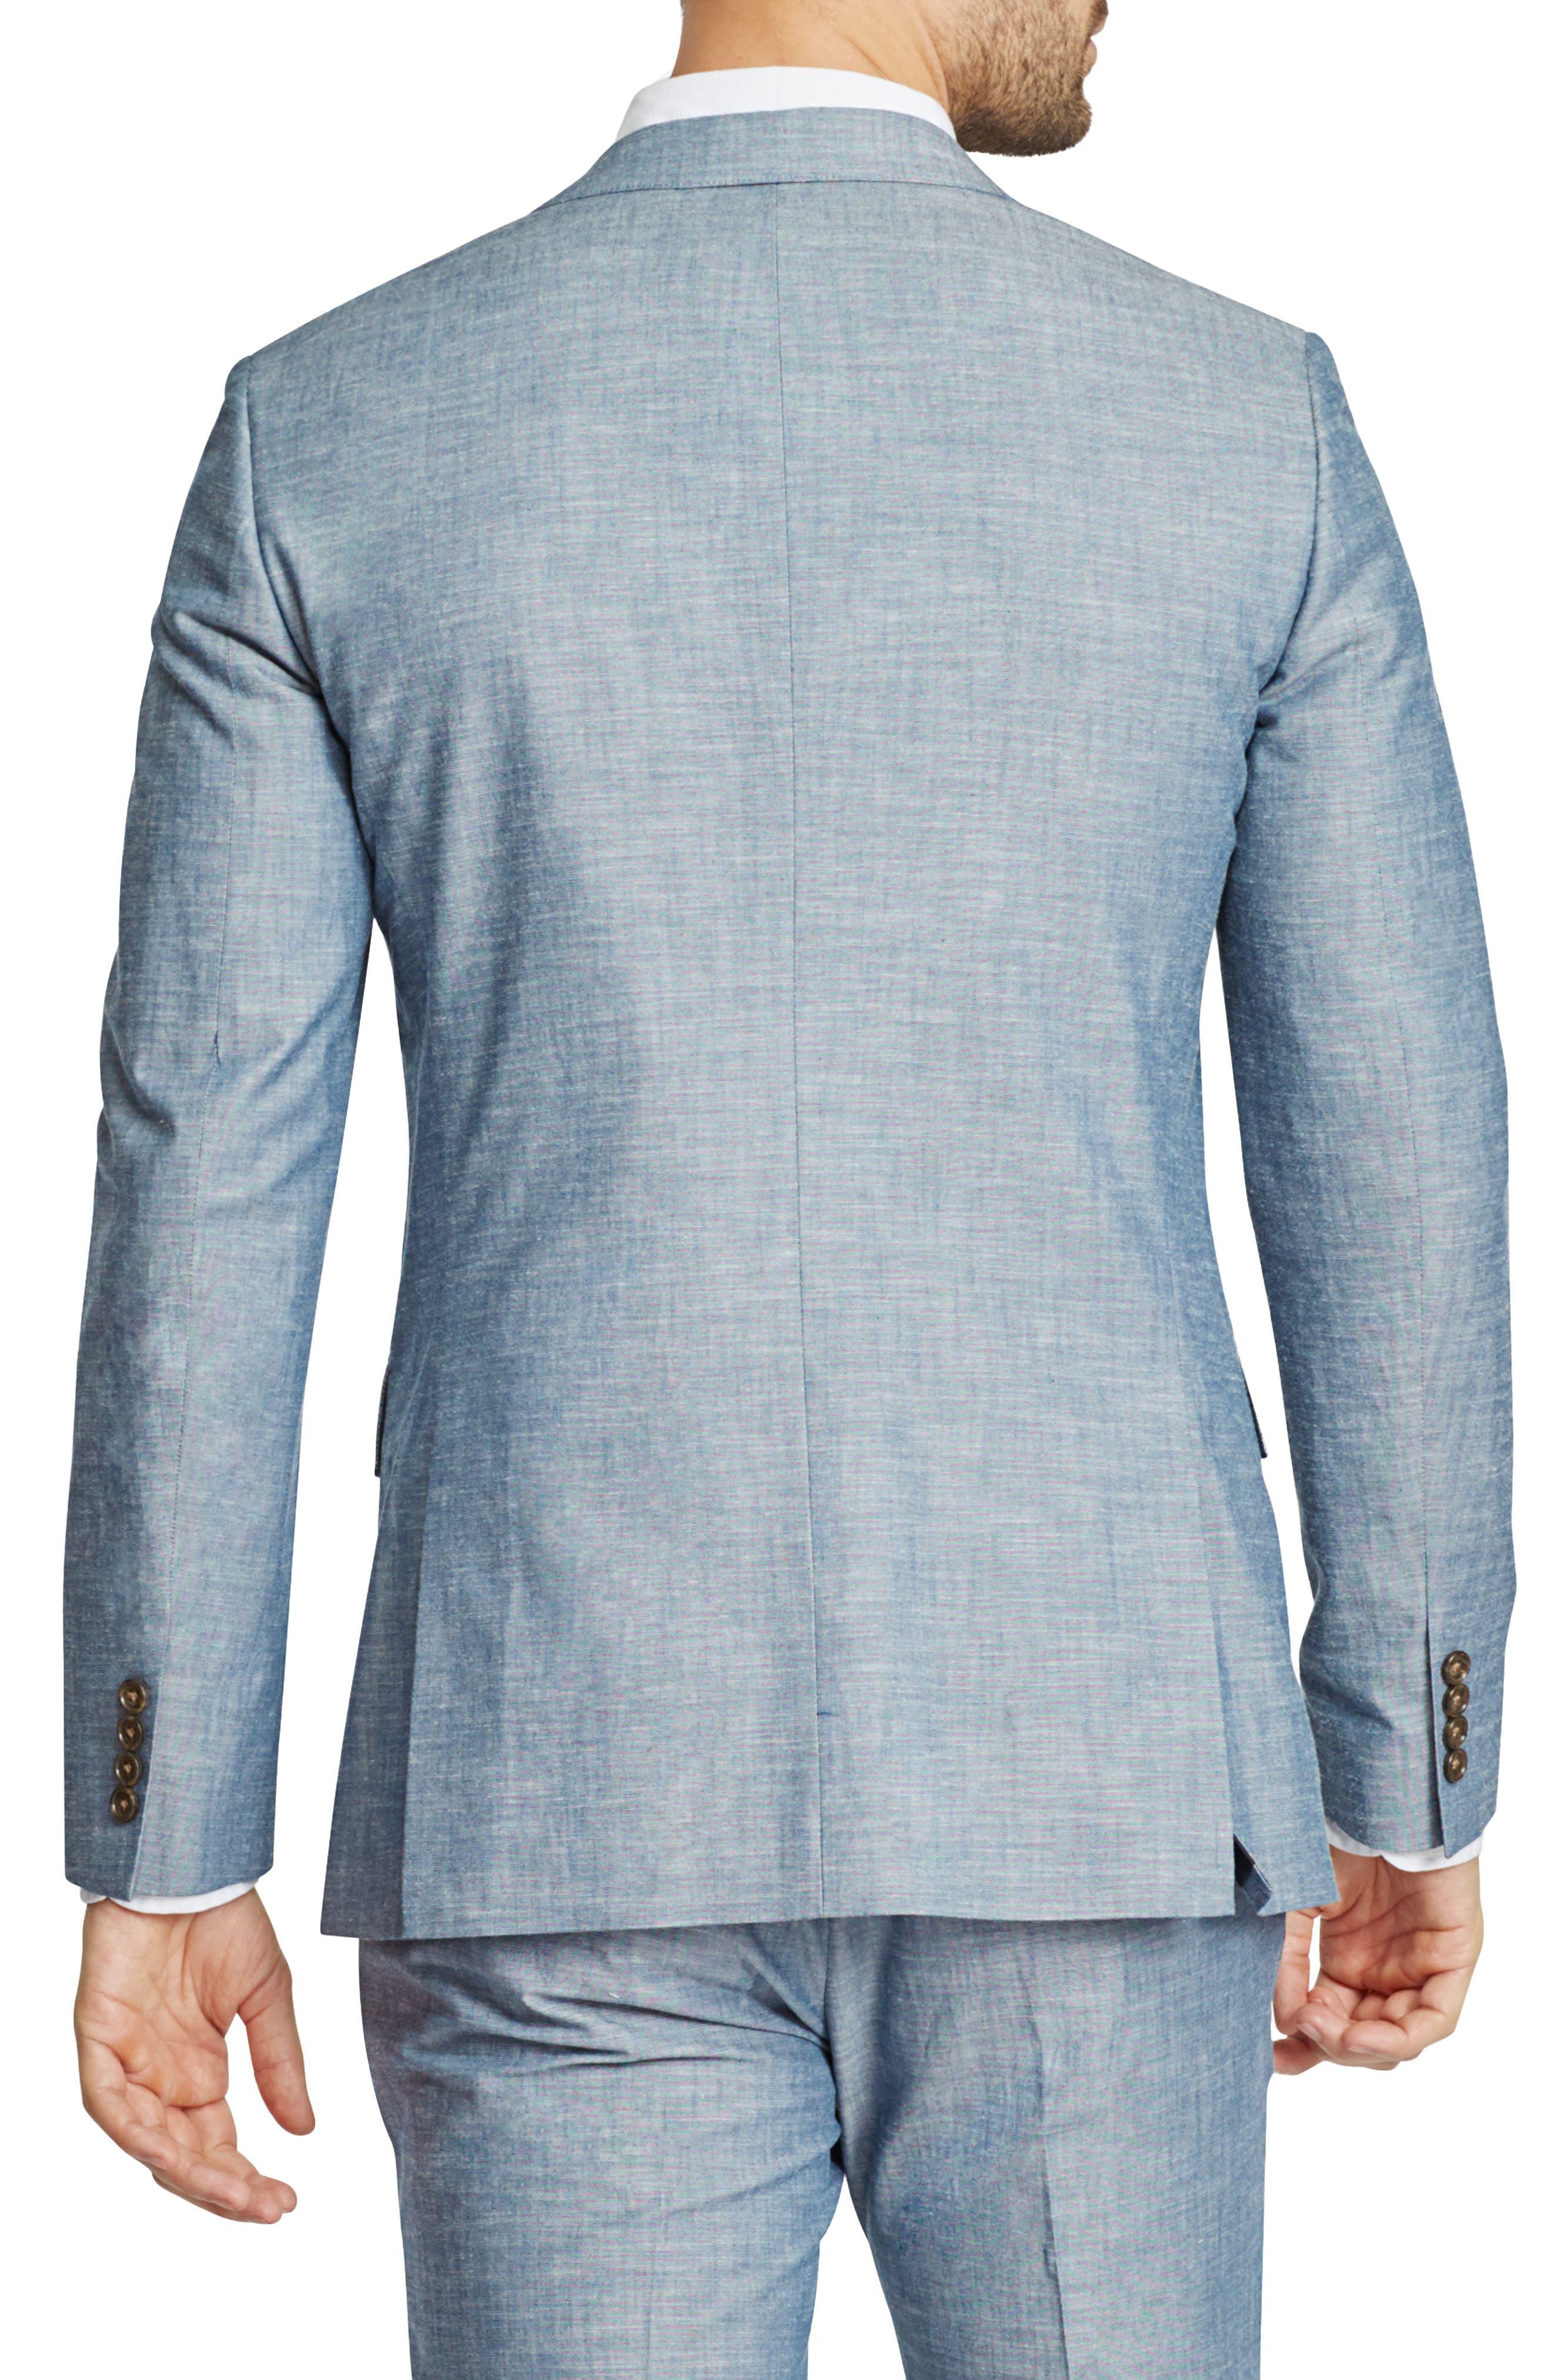 BONOBOS, Slim Fit Chambray Cotton Blazer, Alternate thumbnail 2, color, SOLID BLUE